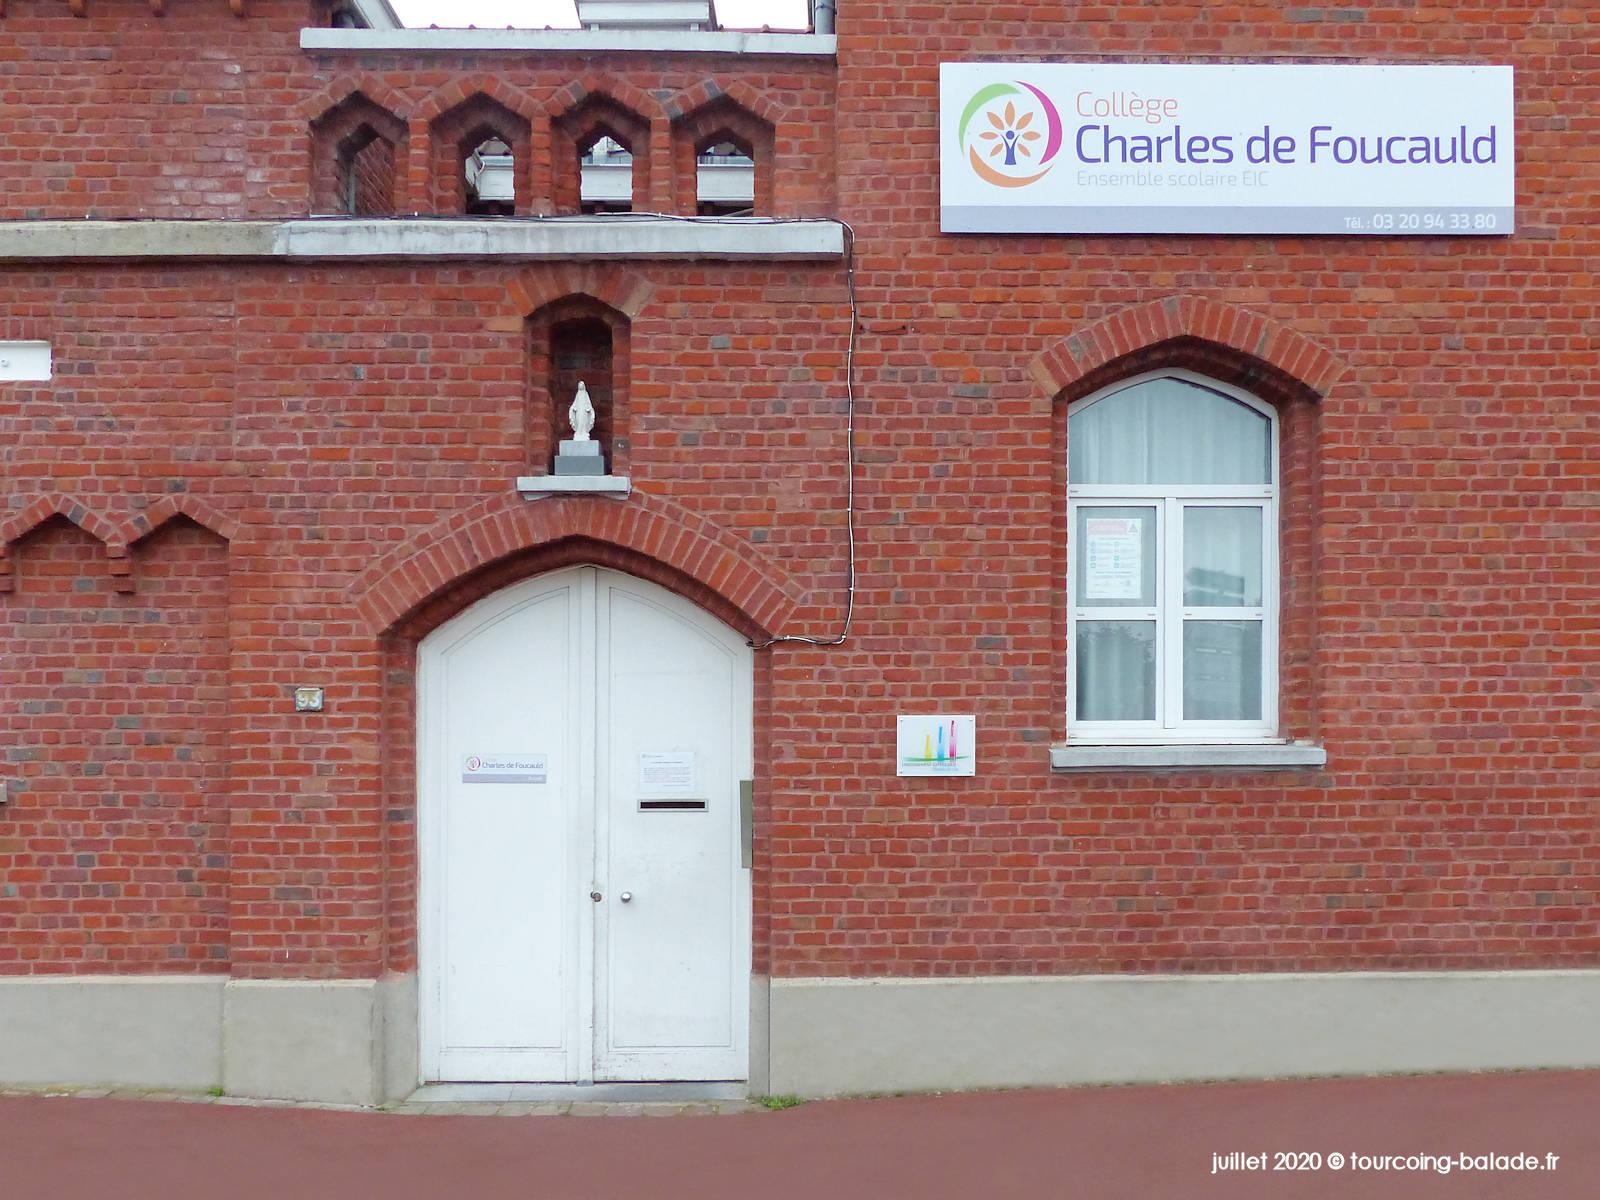 Niche Murale Tourcoing - Collège Foucauld 2020